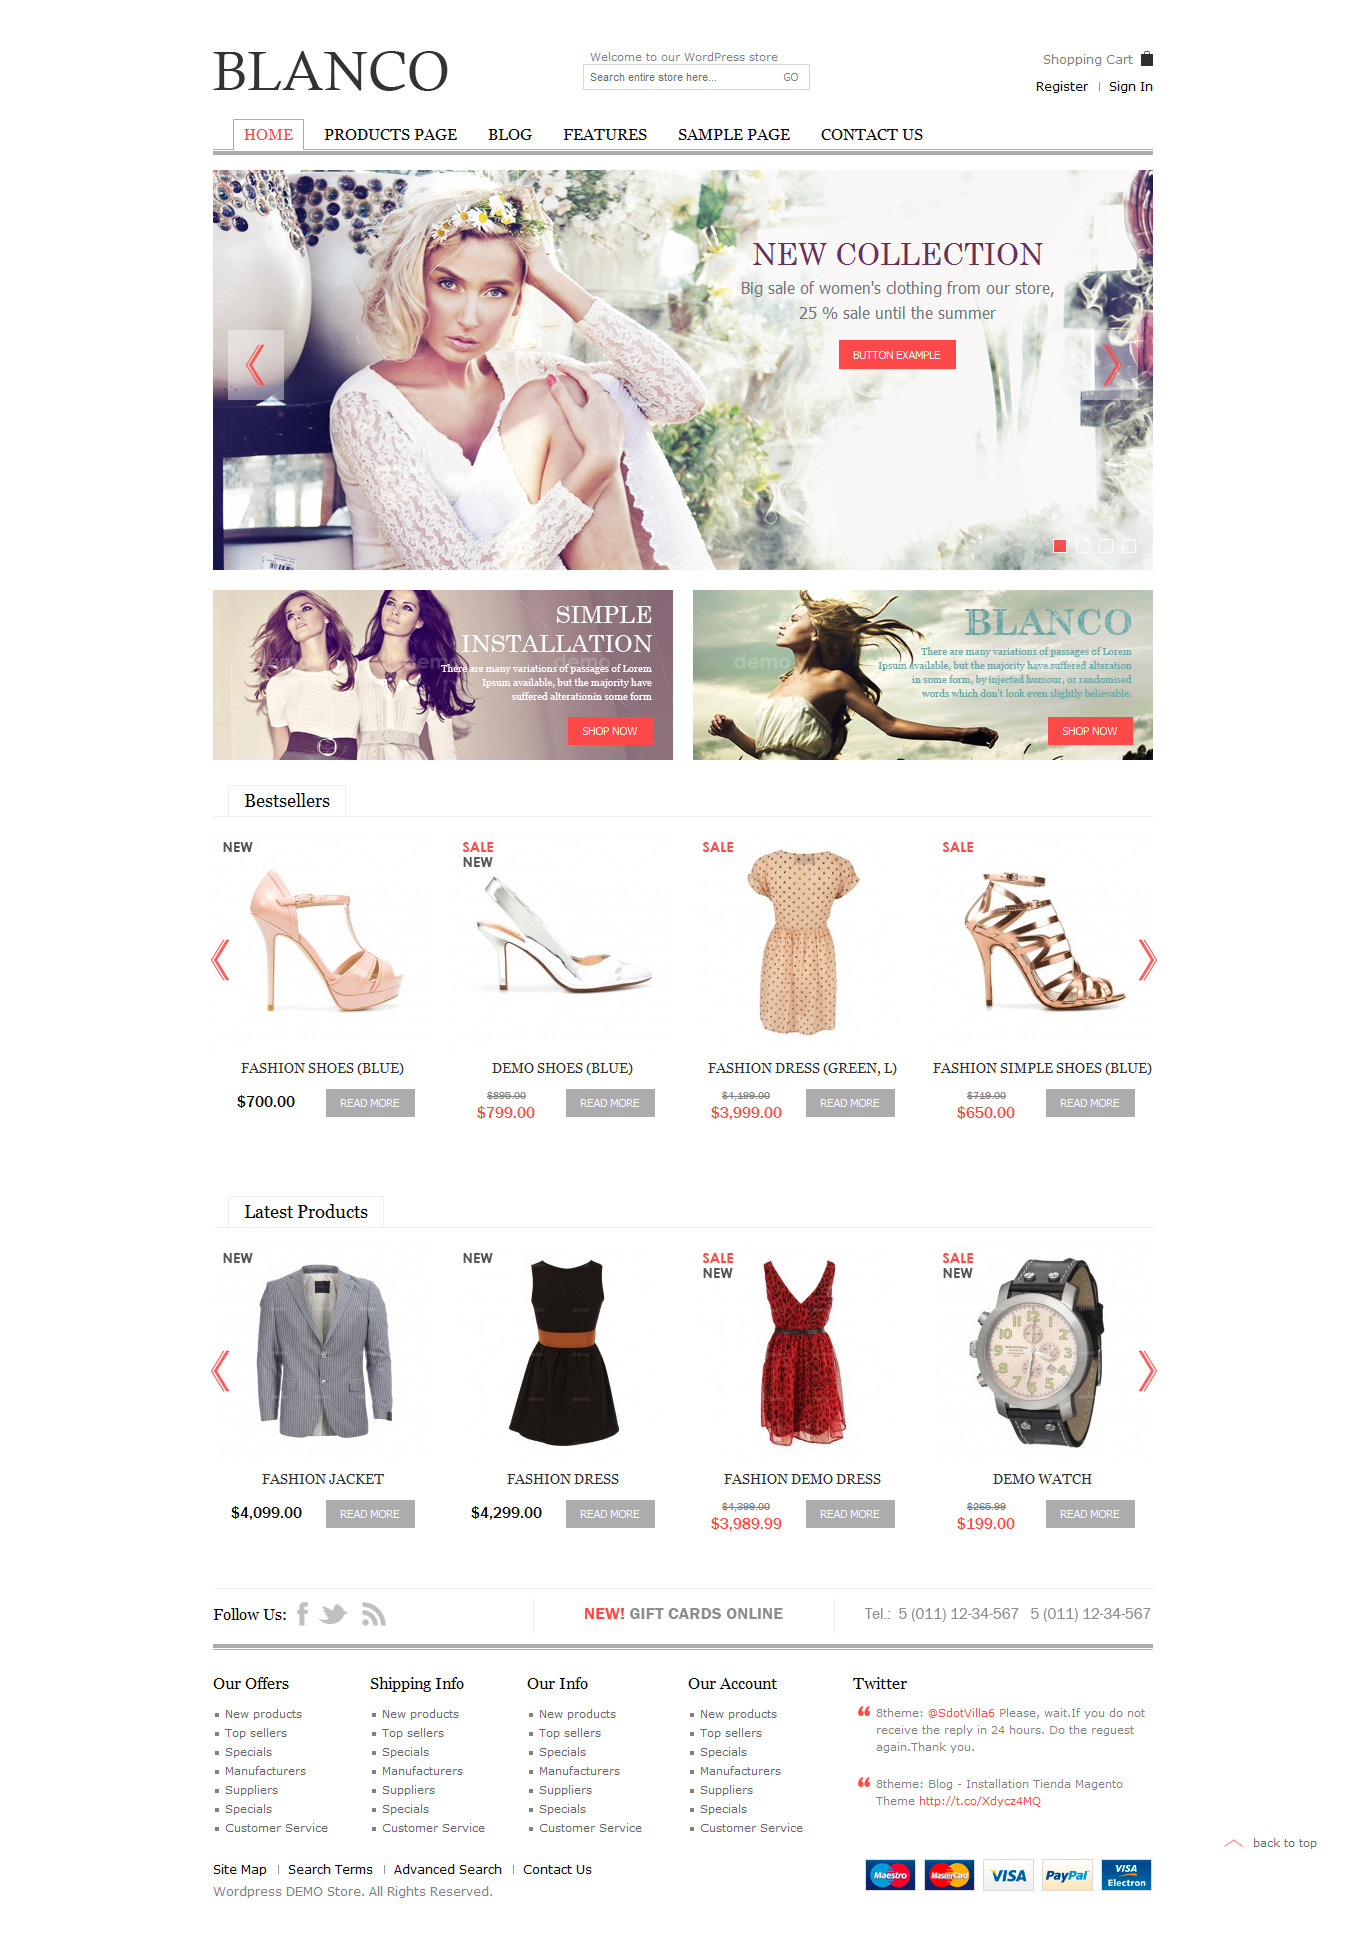 Blanco - Responsive WordPress WooCommerce Theme - Ecommerce>WooCommerce